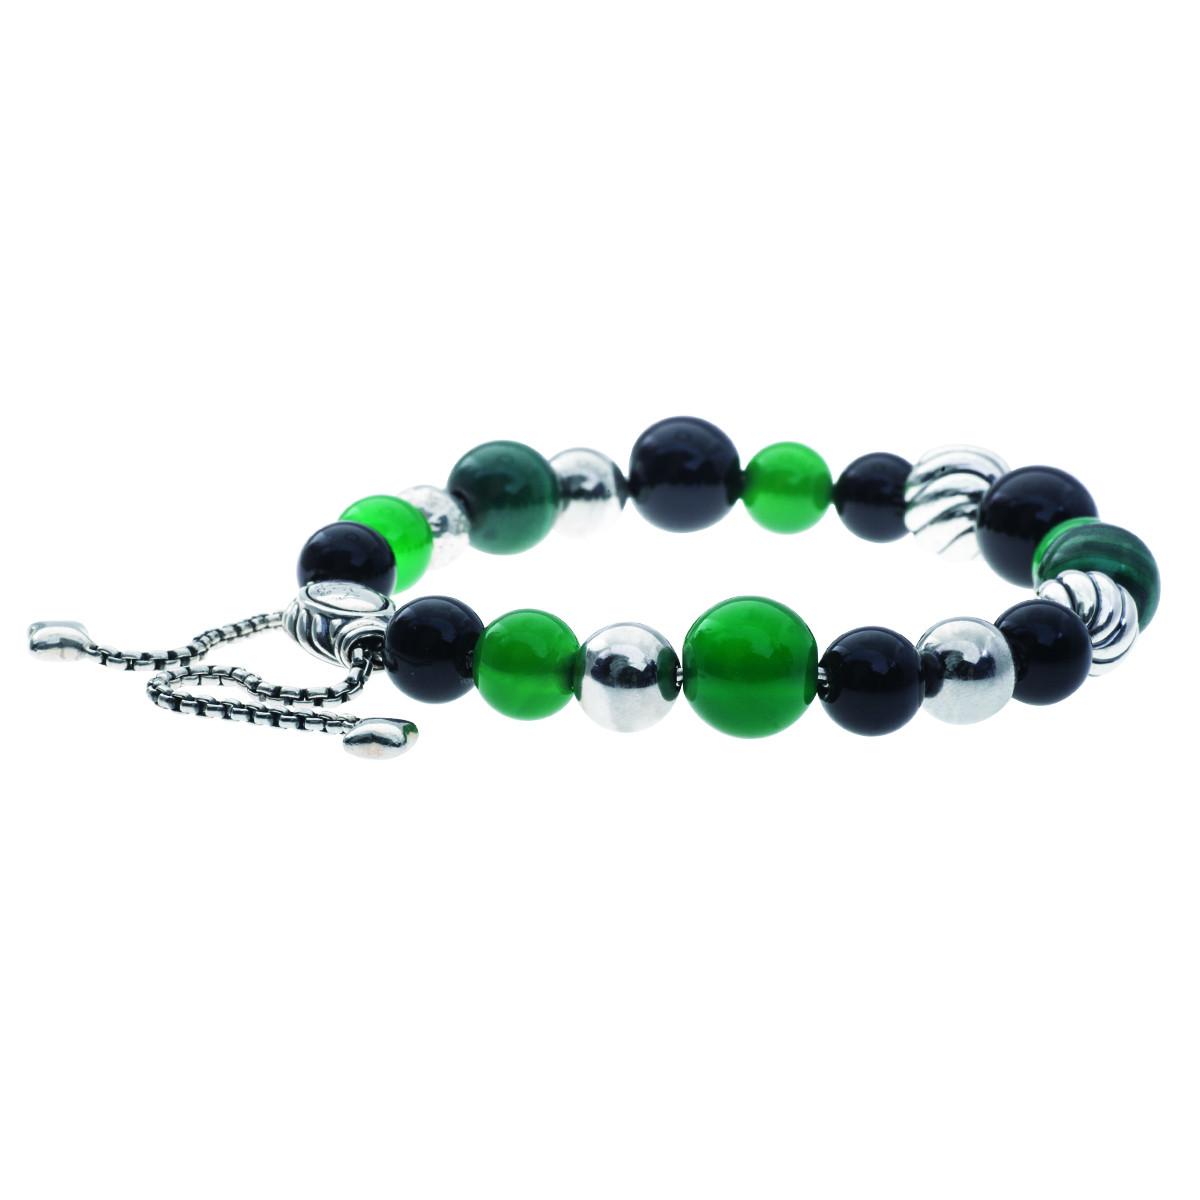 Vintage David Yurman Spiritual Bead Bracelet